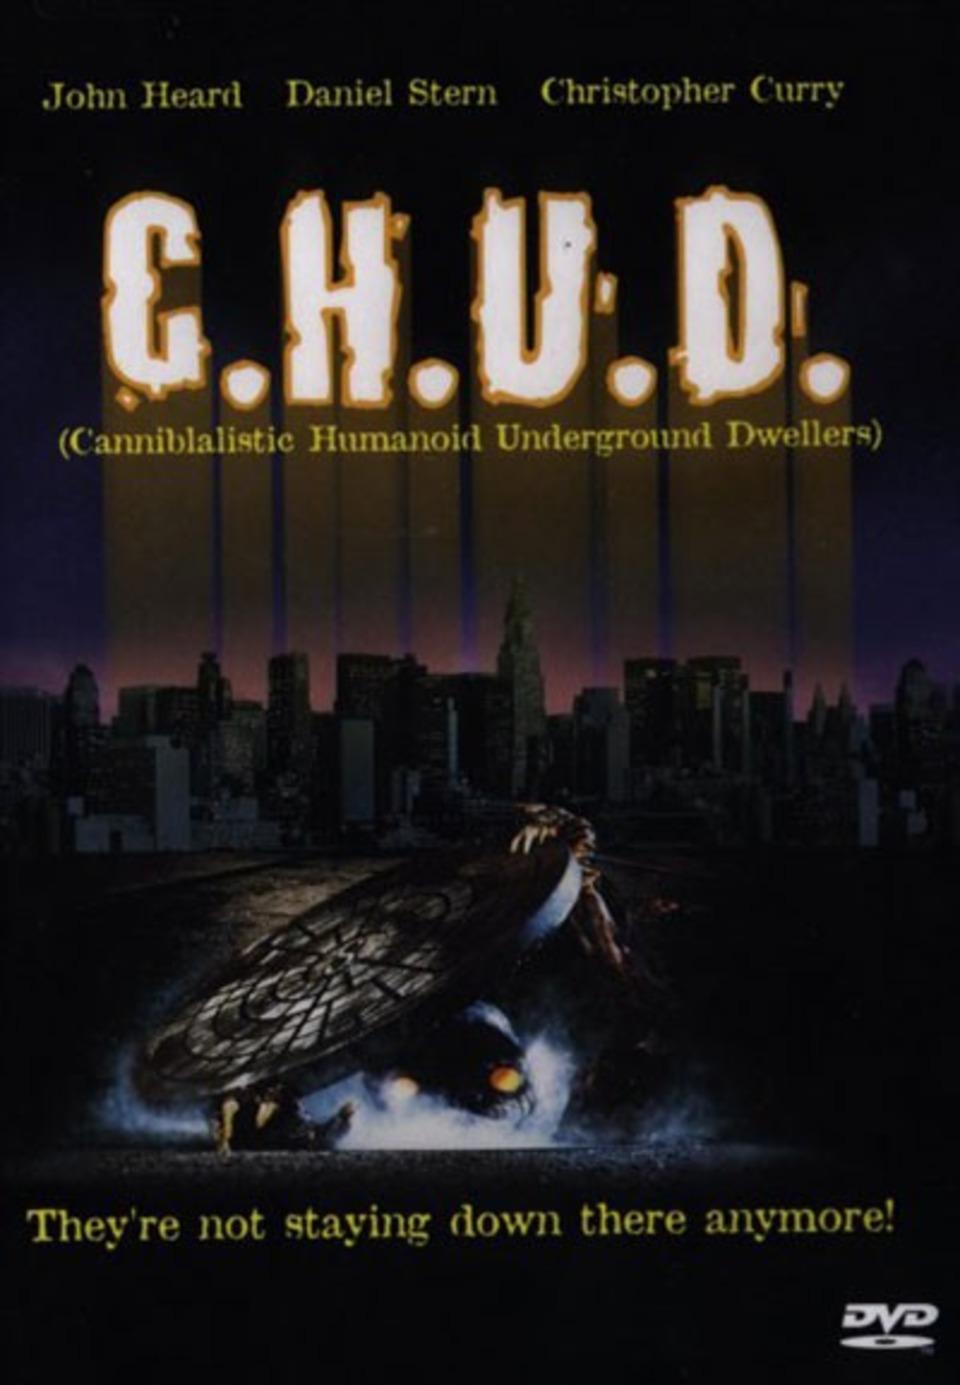 chud_dvd